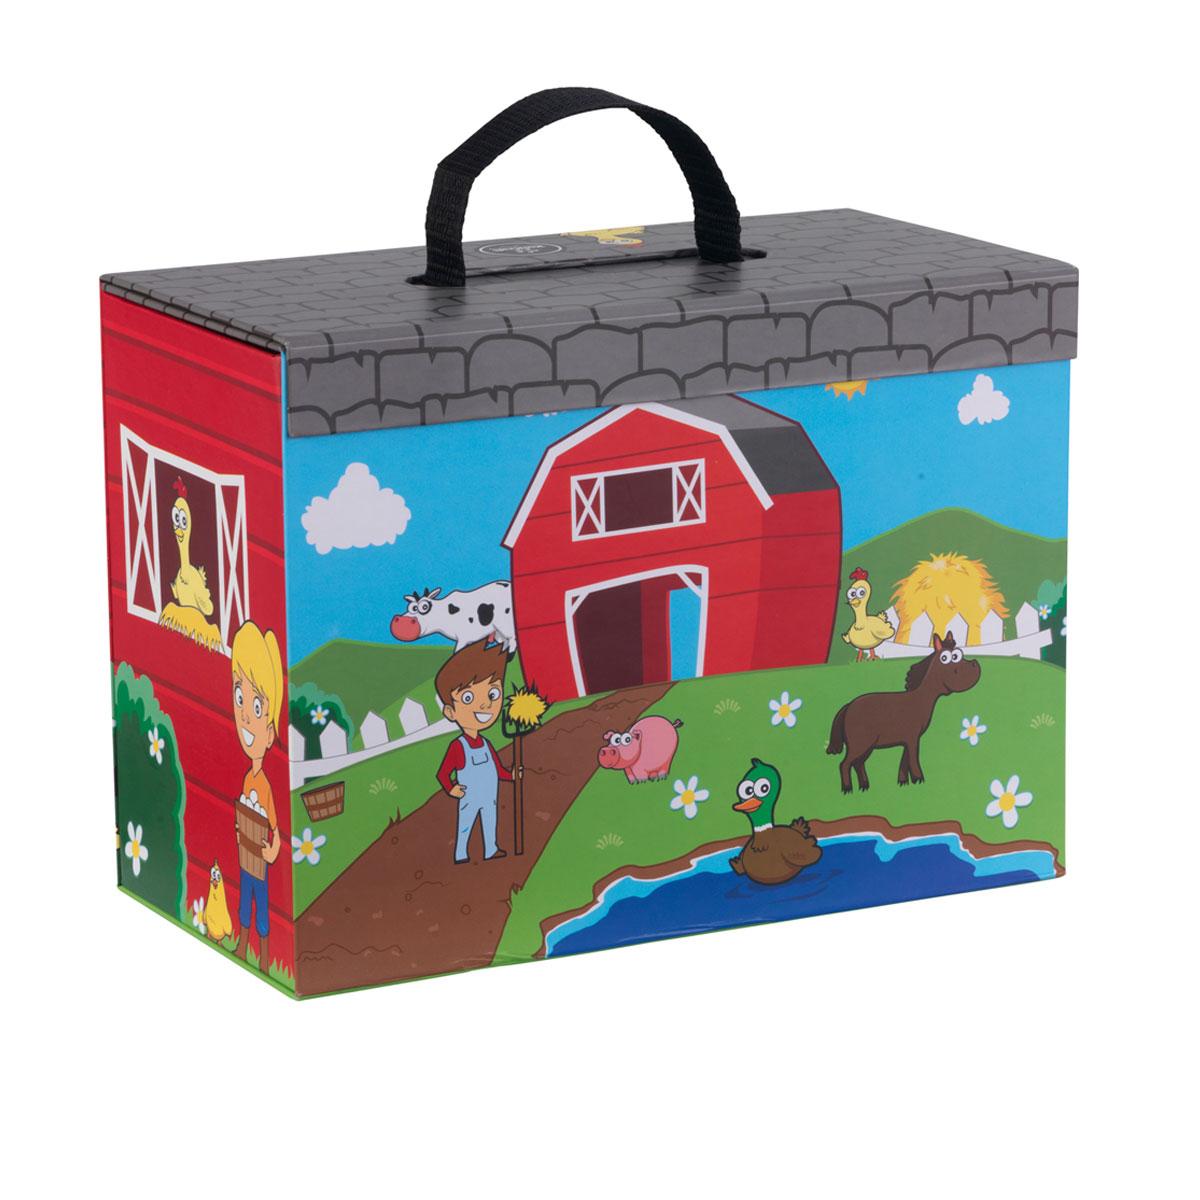 Kidkraft Travel Box Play Set - Farm  sc 1 st  Pirum-Holzspielzeuge & Kidkraft Travel Box Play Set - Farm 63386 | Pirum Wooden Toys Aboutintivar.Com